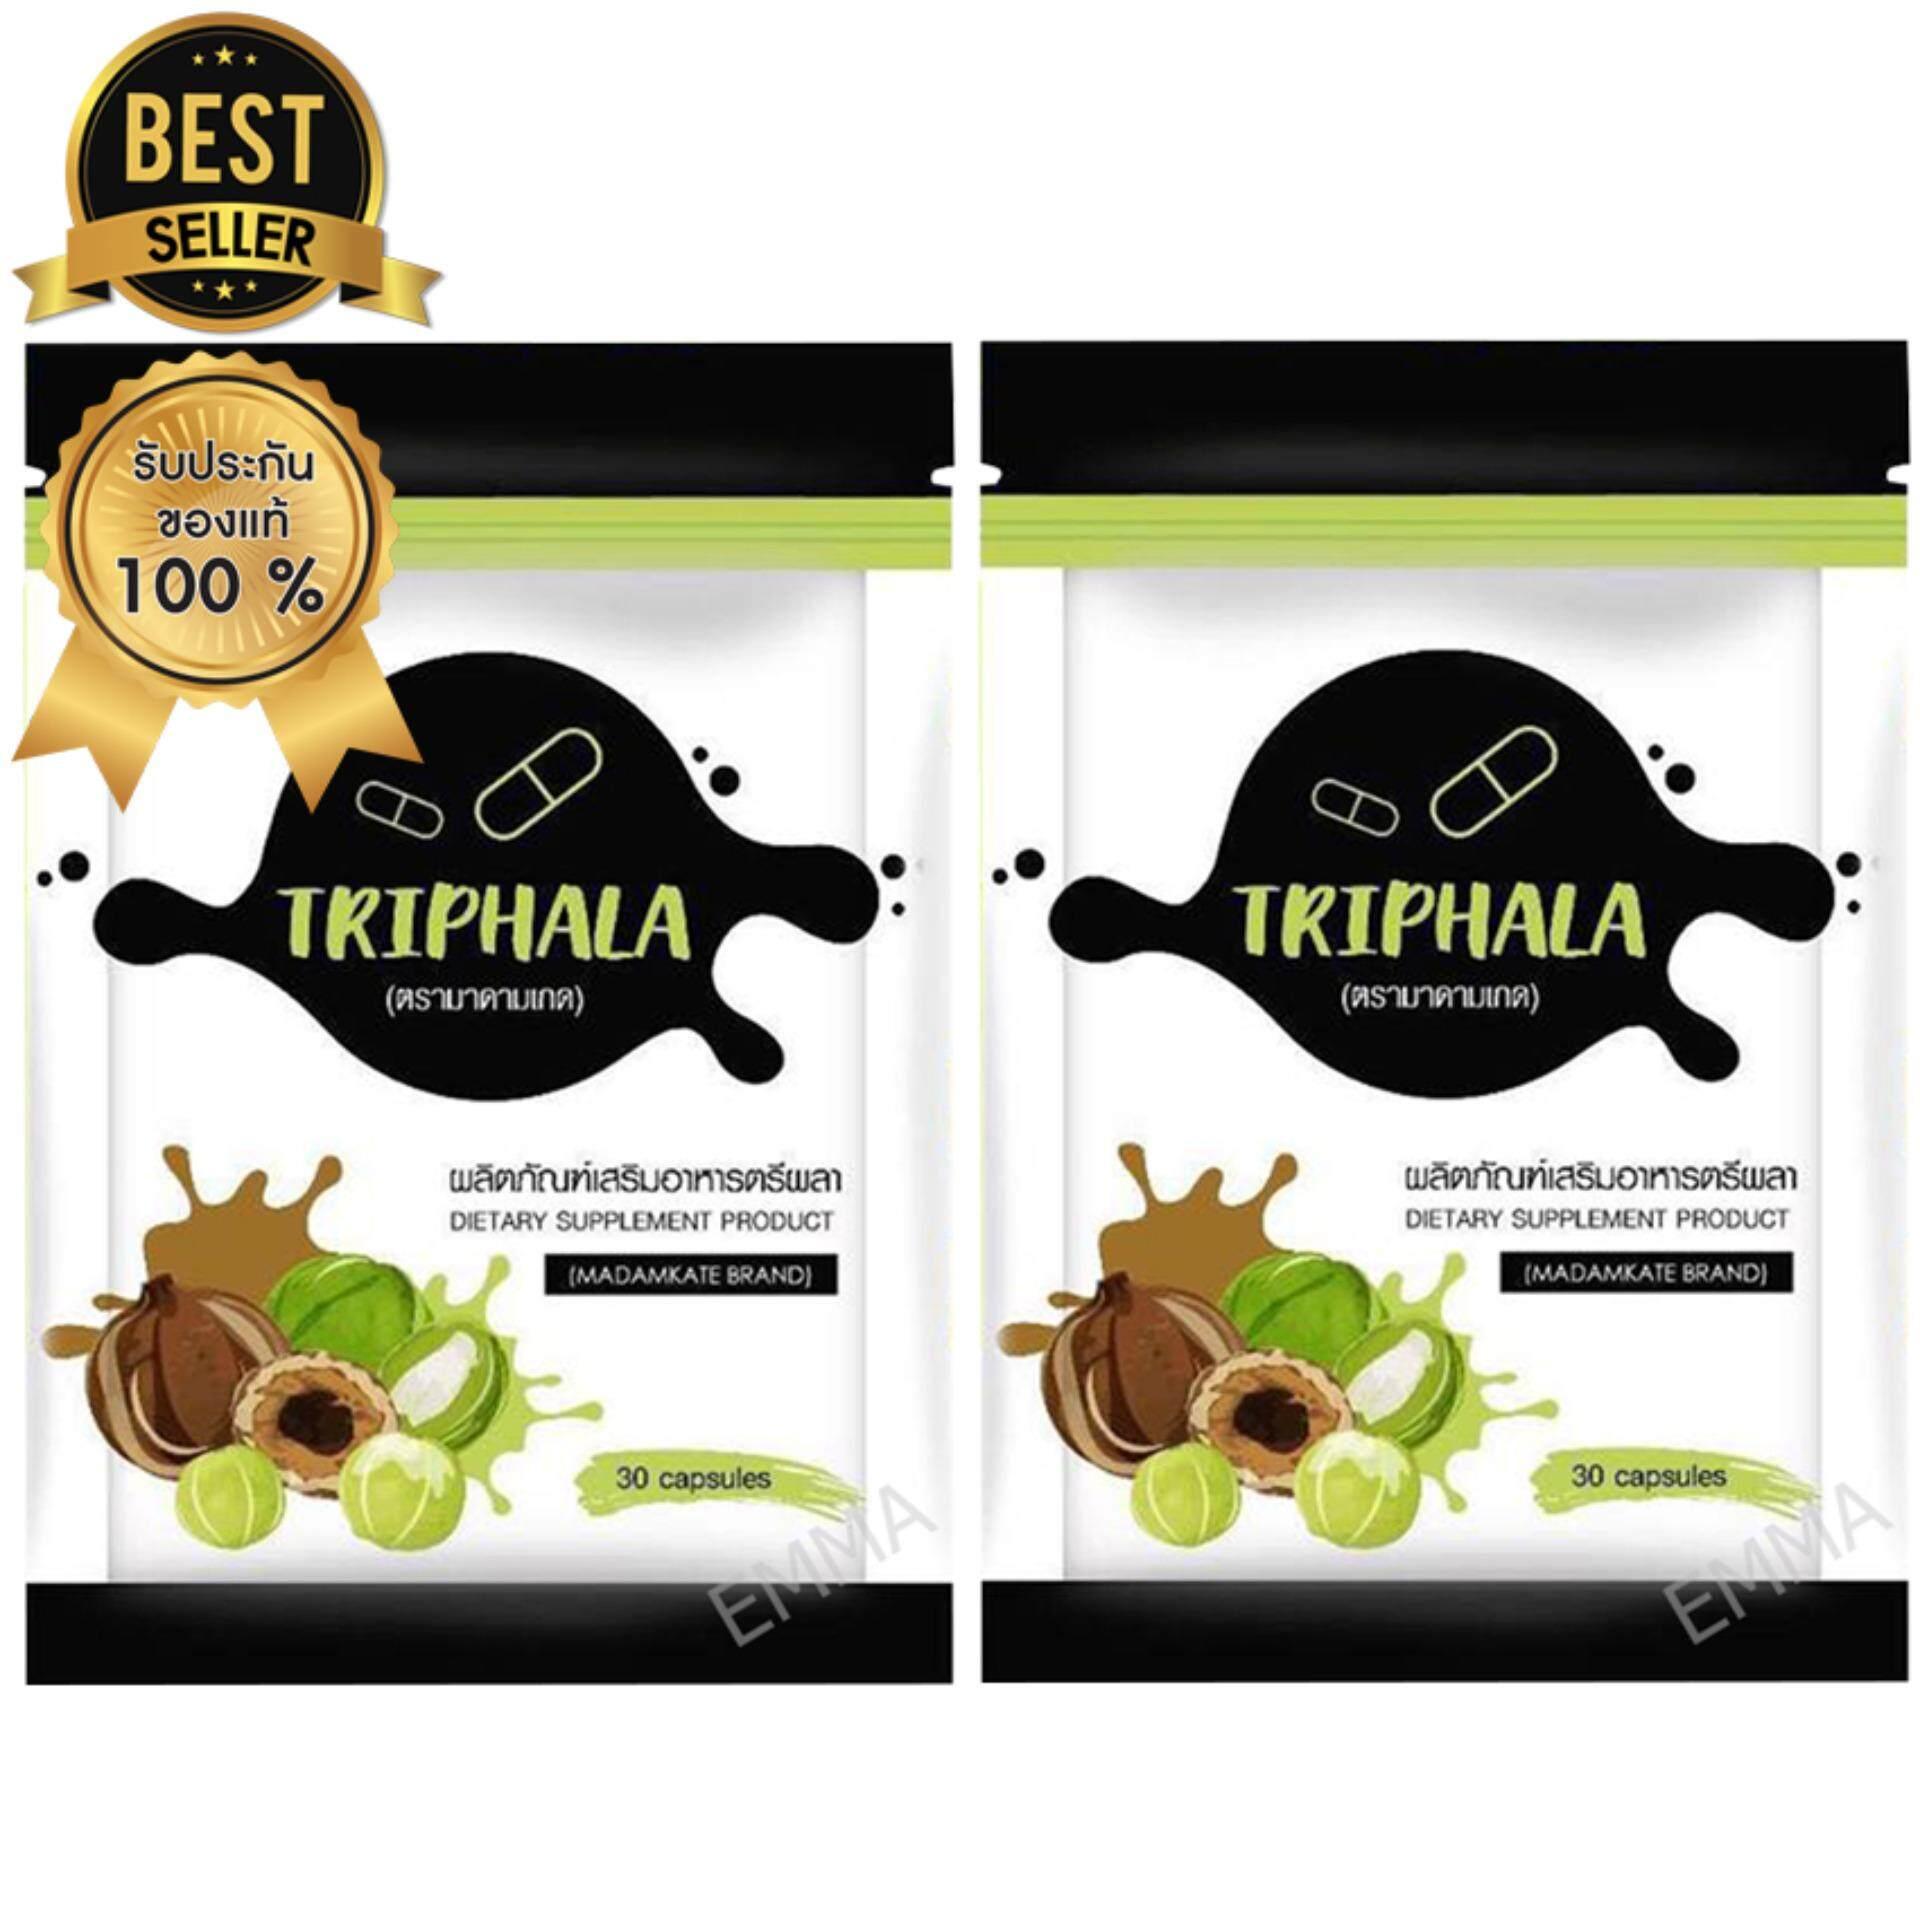 Triphala ตรีผลา By Madam Kate ผลิตภัณฑ์เสริมอาหารตรีผลา (ตรา มาดามเกด) สมุนไพรระเบิดพุงโฉมใหม่ ขนาด 30 แคปซูล (2 ซอง).